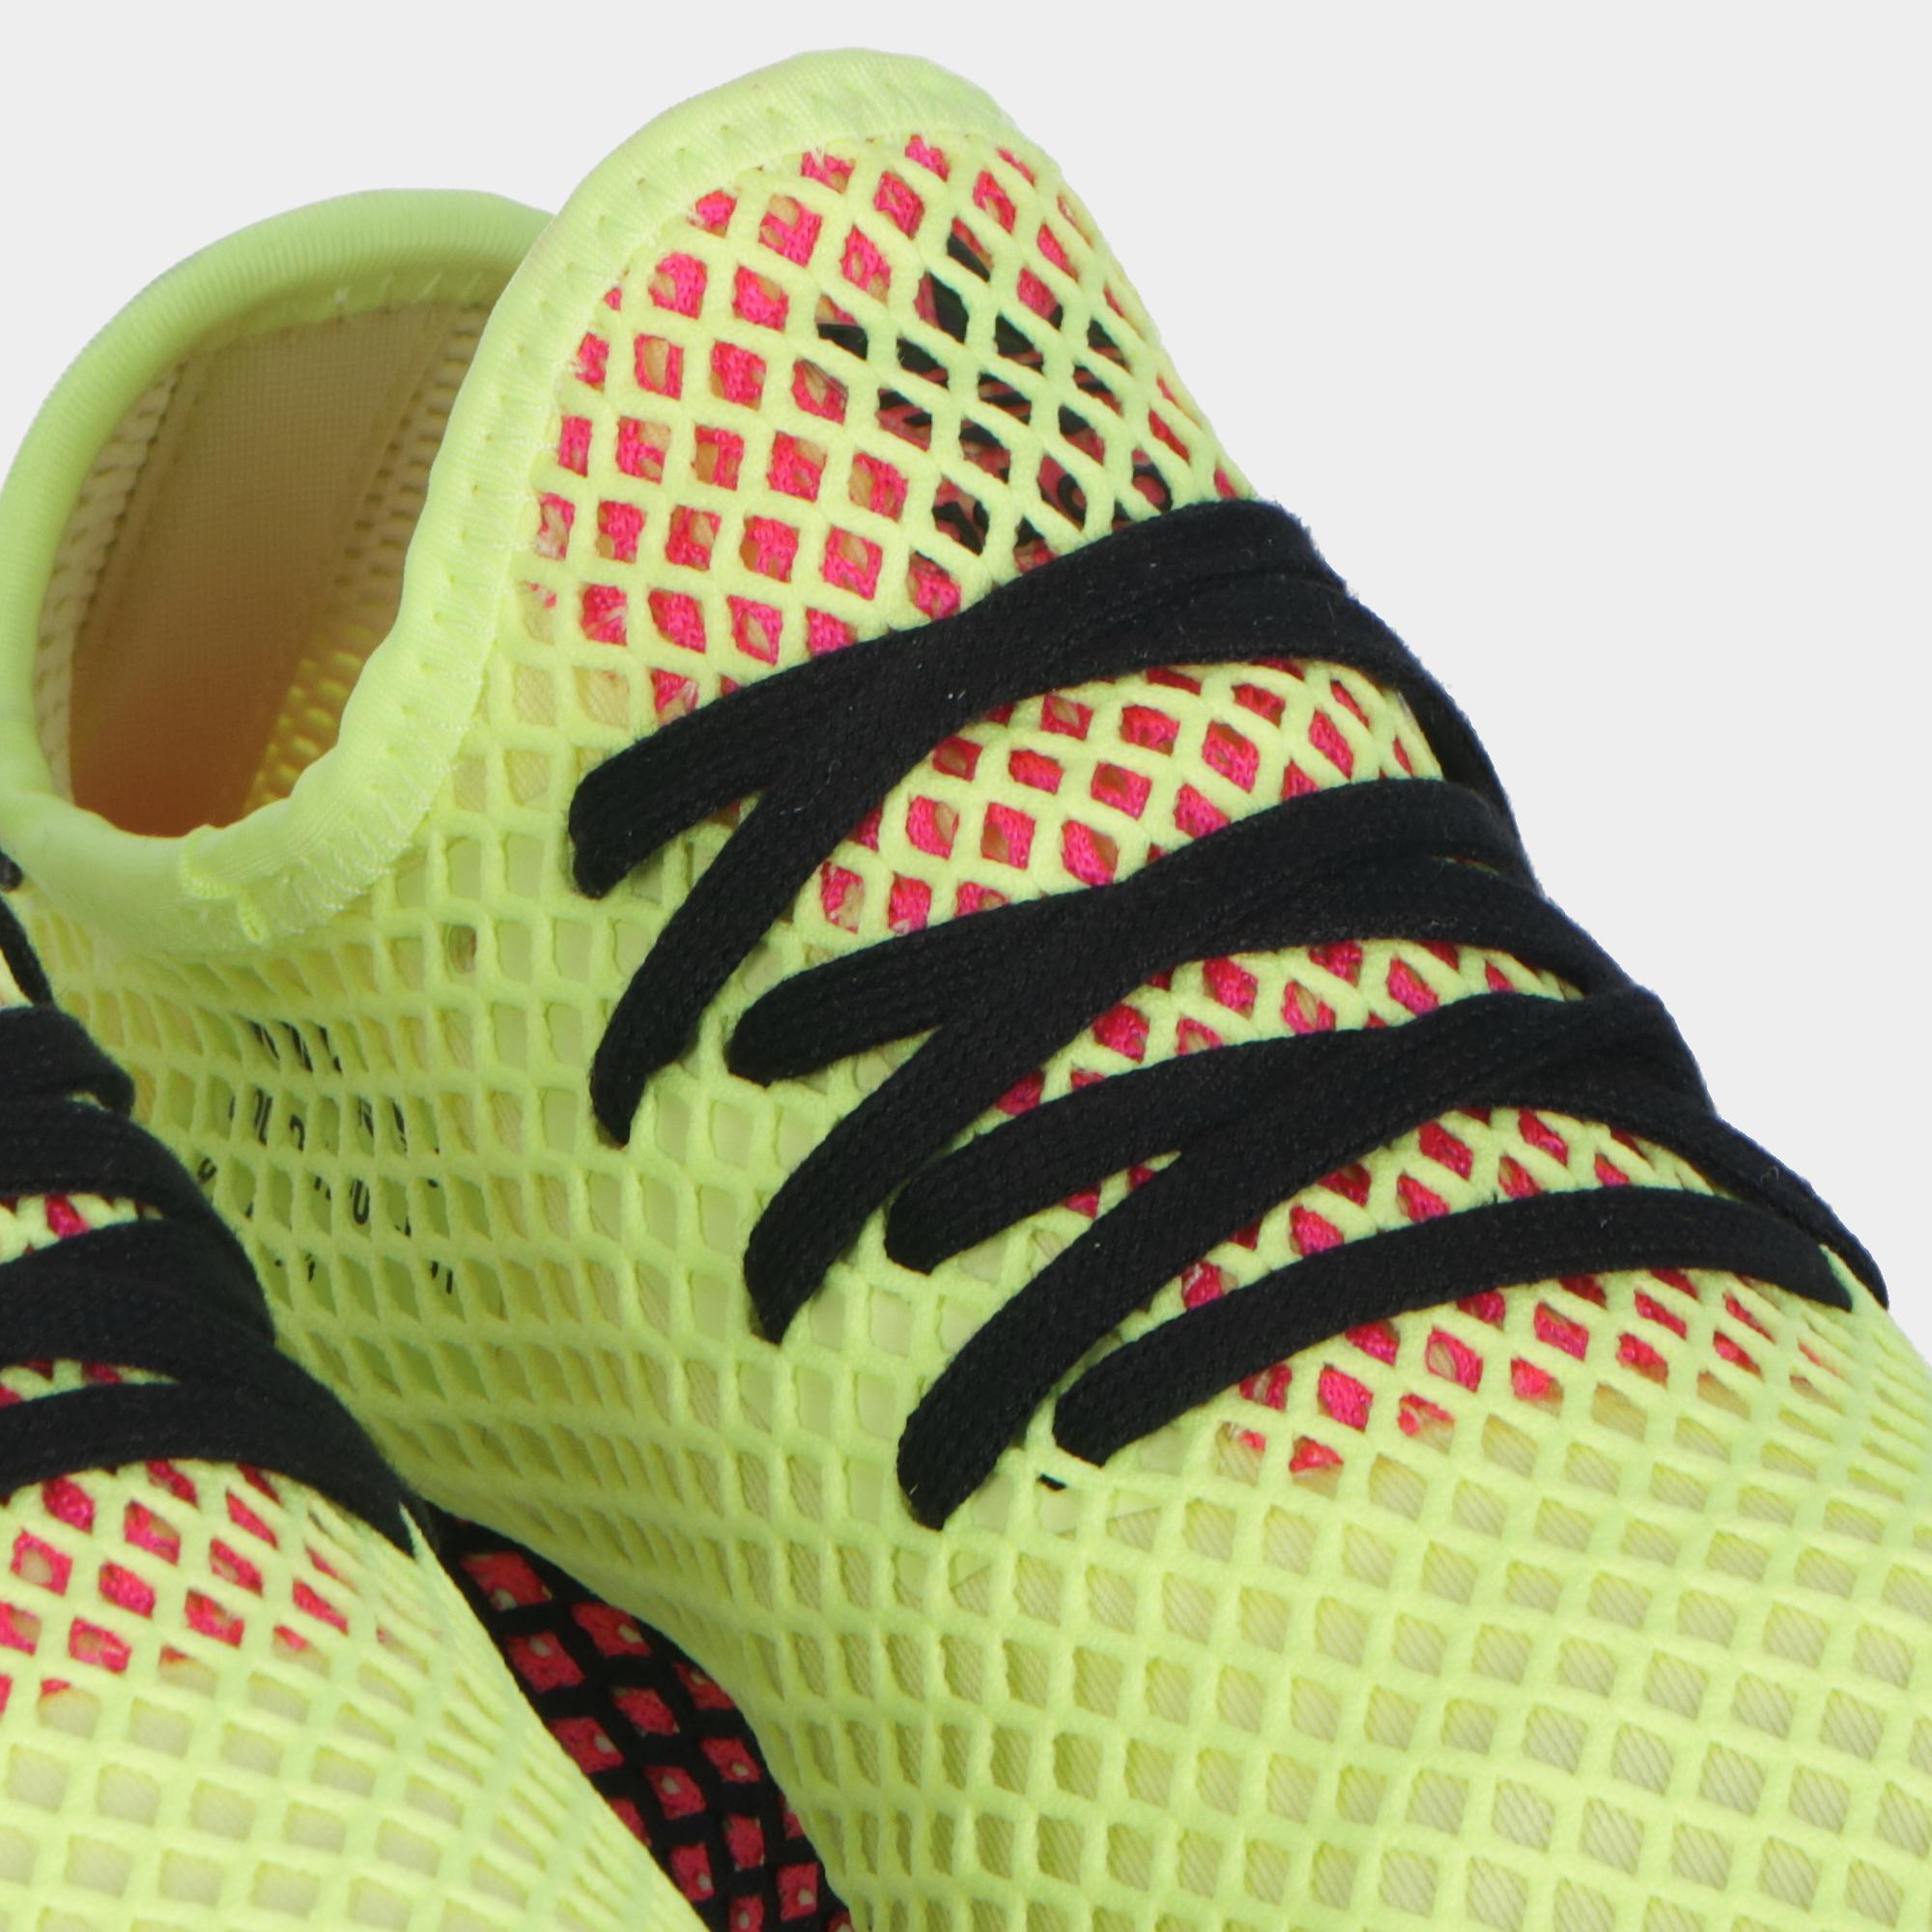 593c83f5fc694 Adidas Deerupt Runner Yellow Black Pink